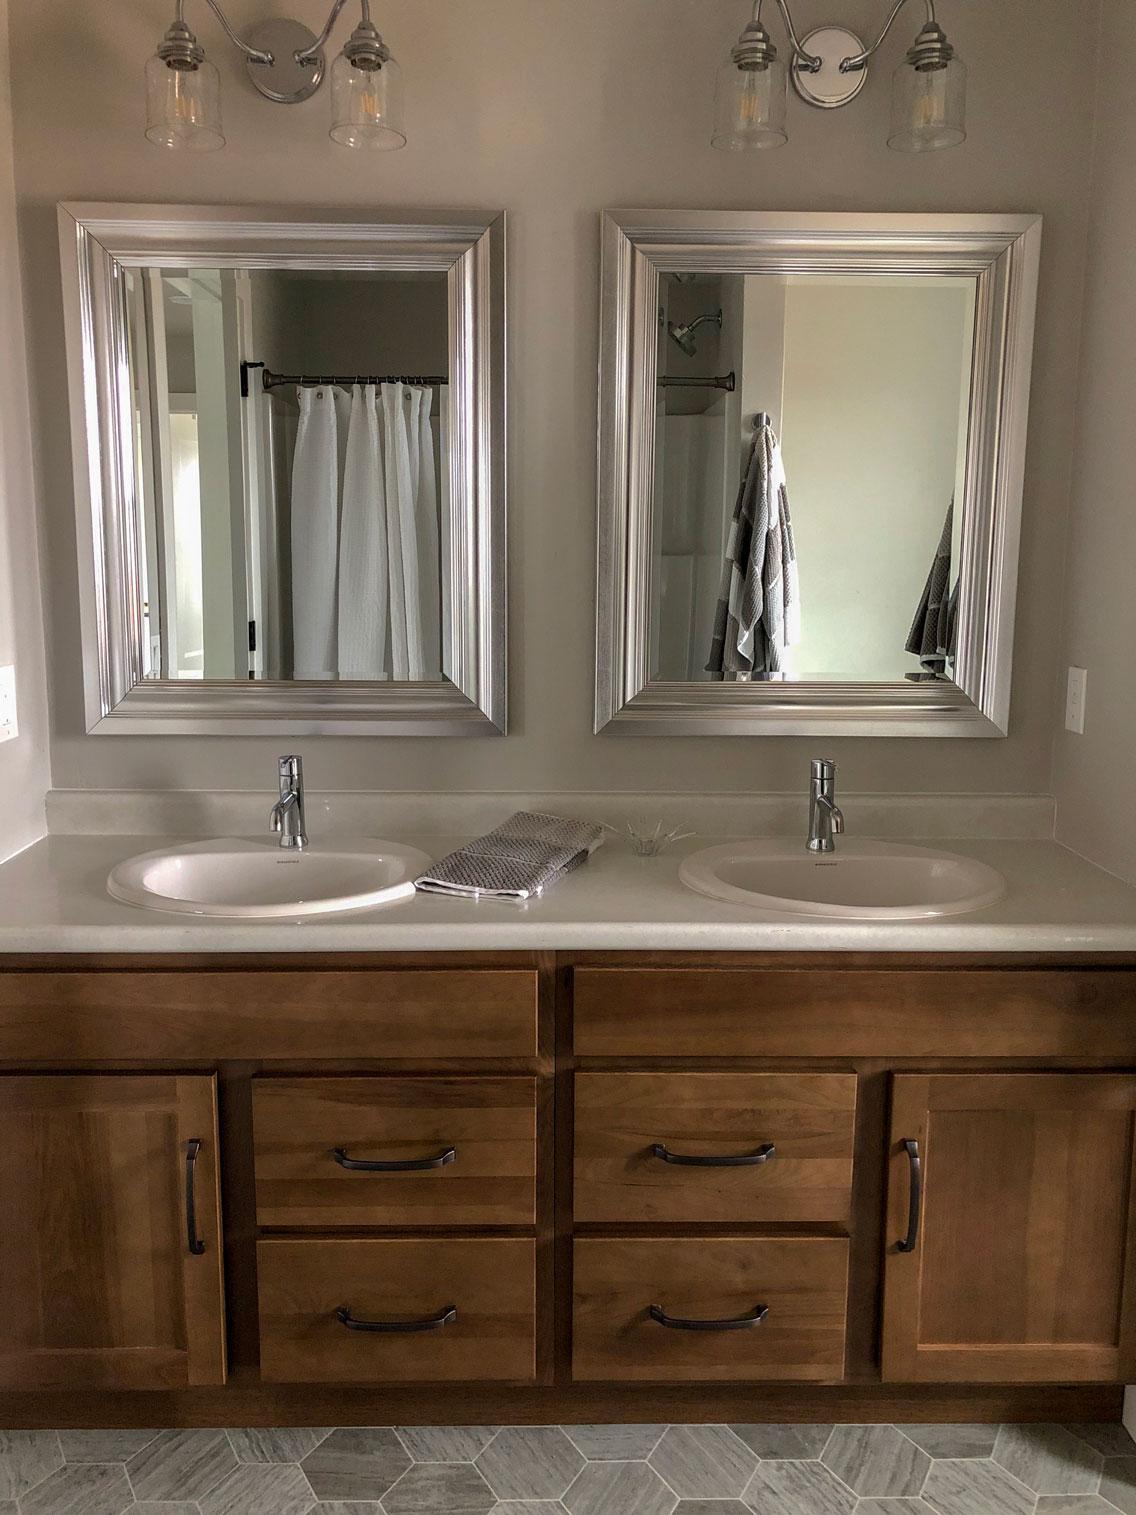 Home For Sale 1600 Cloe Jude Main Bathroom